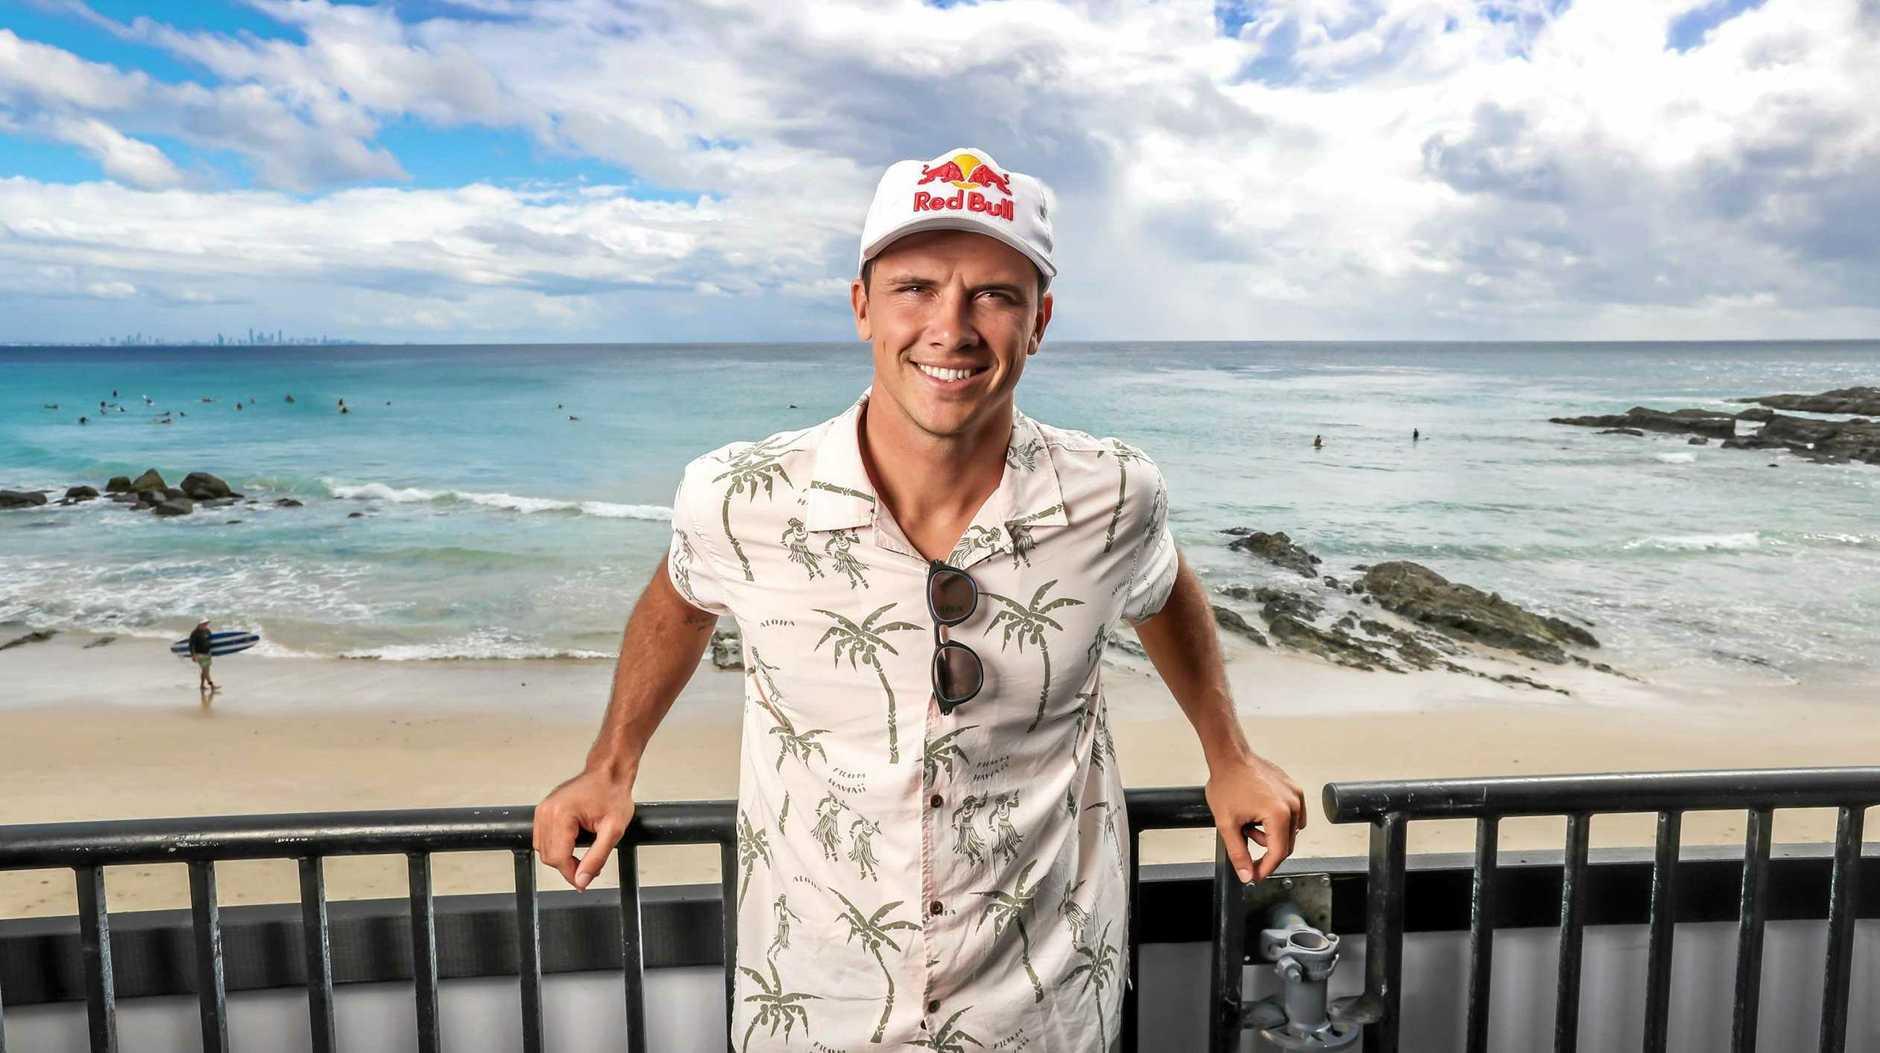 WSL world number 2 surfer Julian Wilson pictured at Snapper Rocks on the Gold Coast.Picture: NIGEL HALLETT